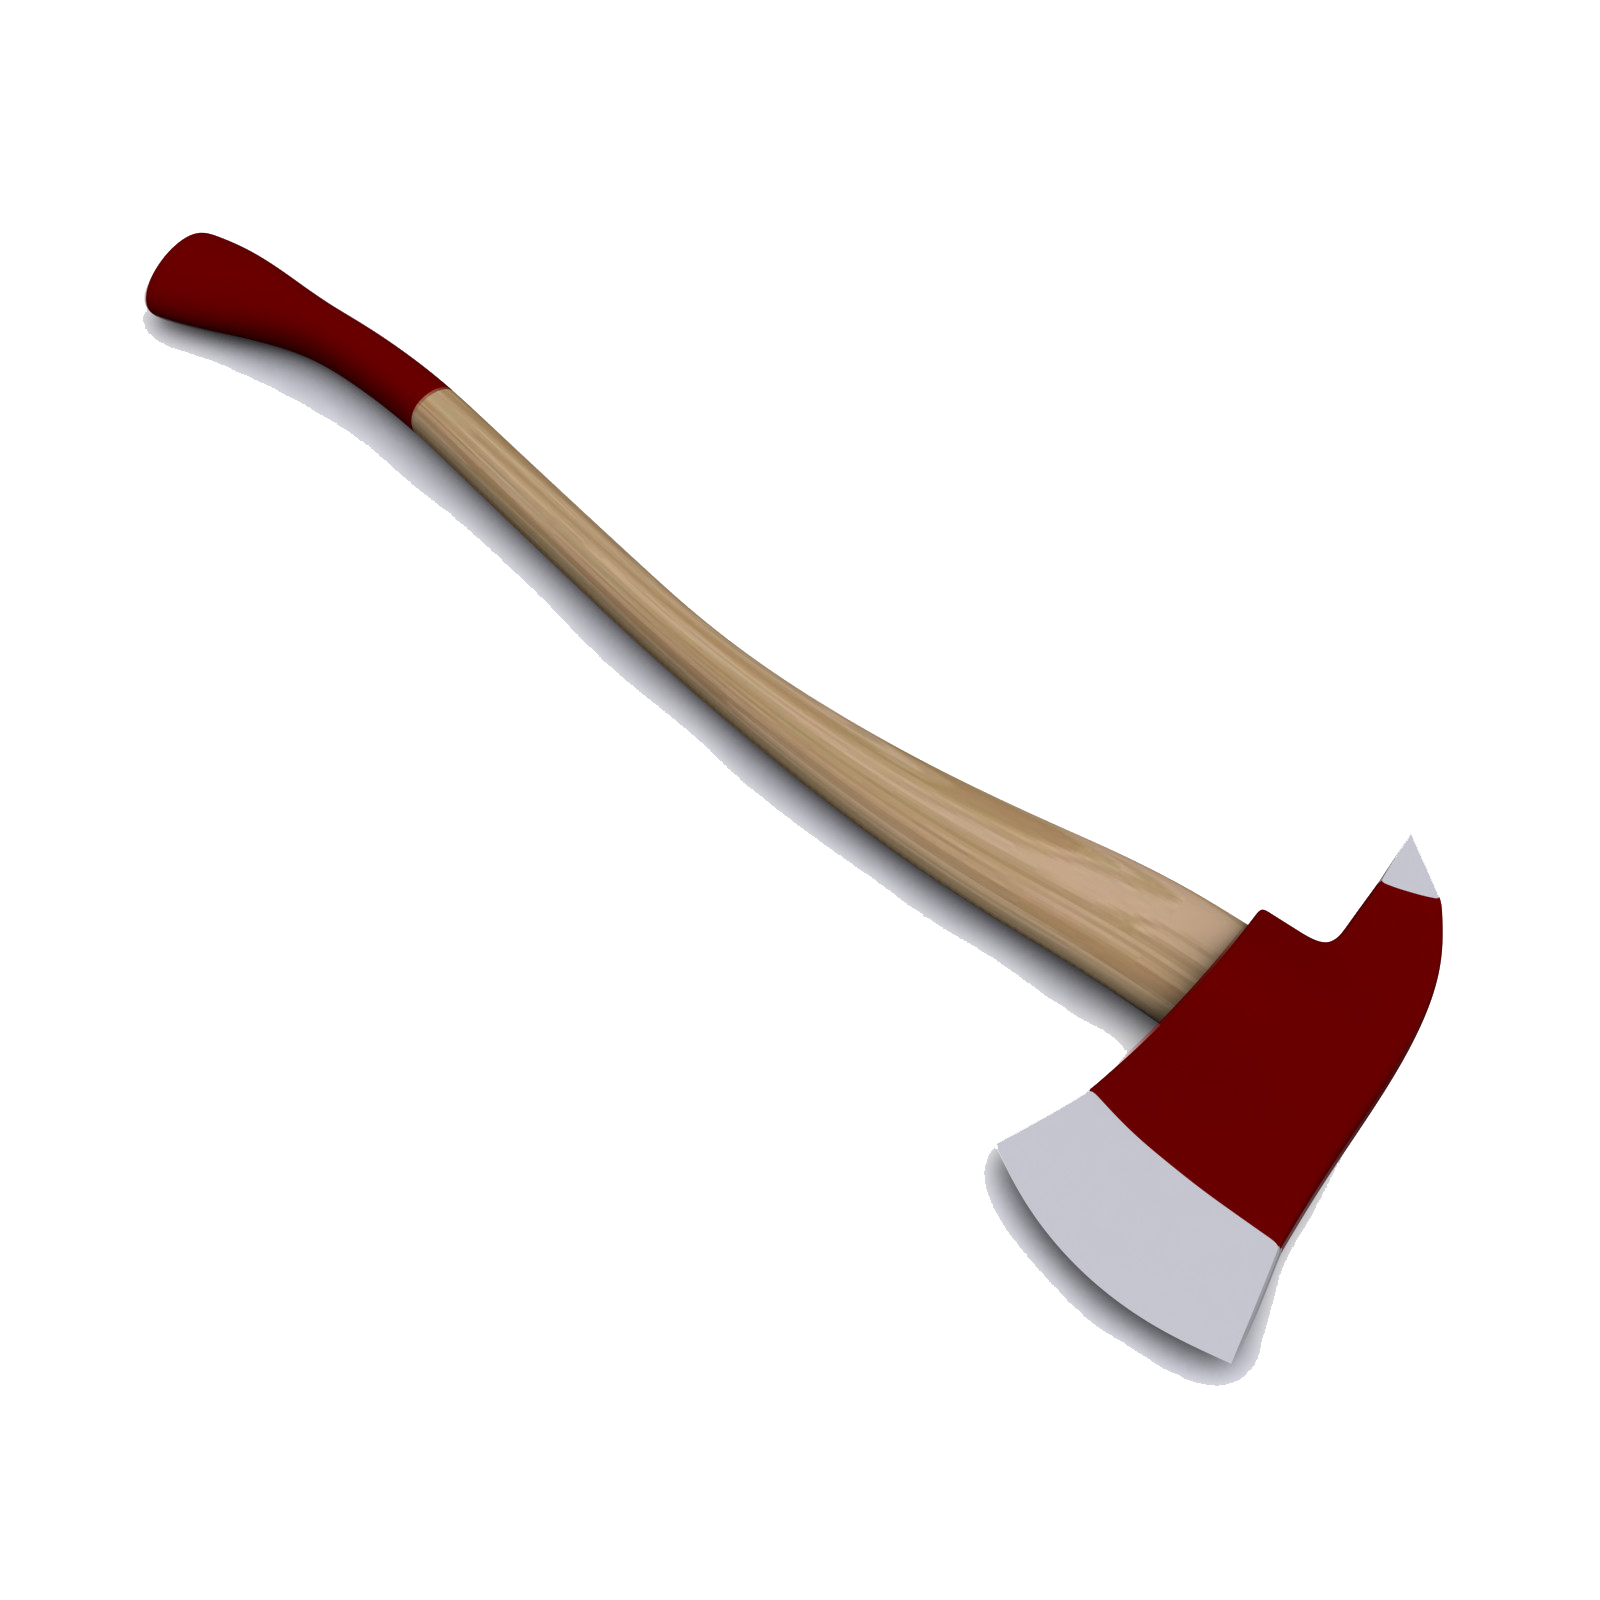 Lumberjack clipart hatchet. Axe png transparent images